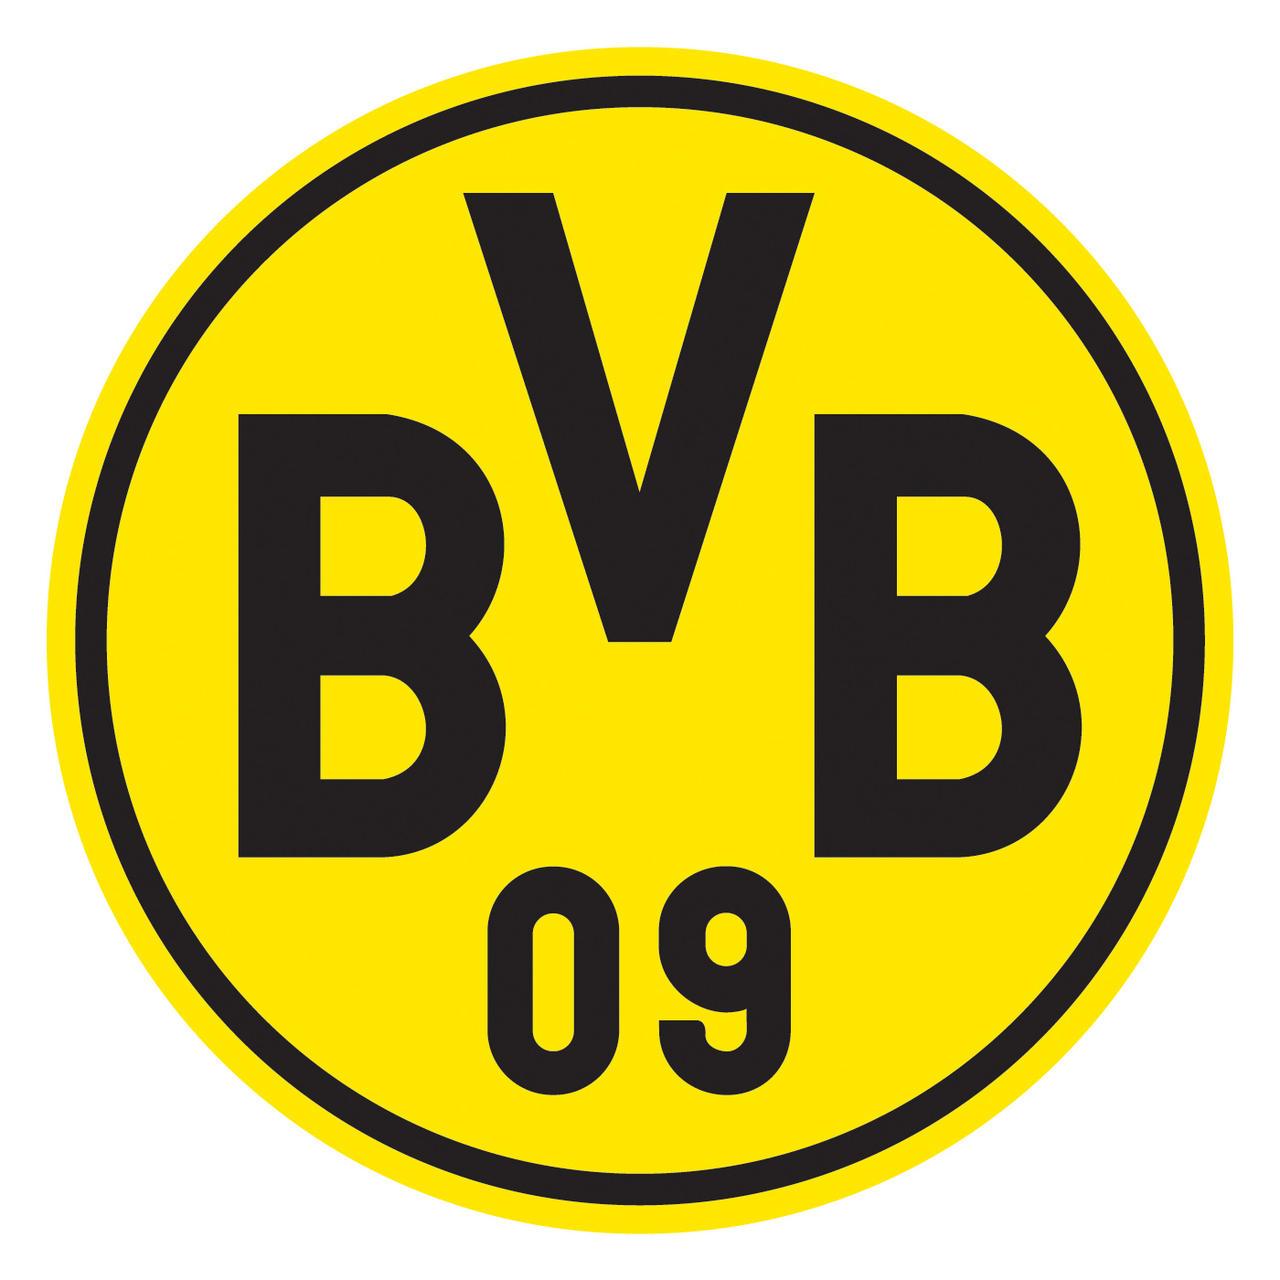 images/BV Borussia Dortmund Logo.jpg